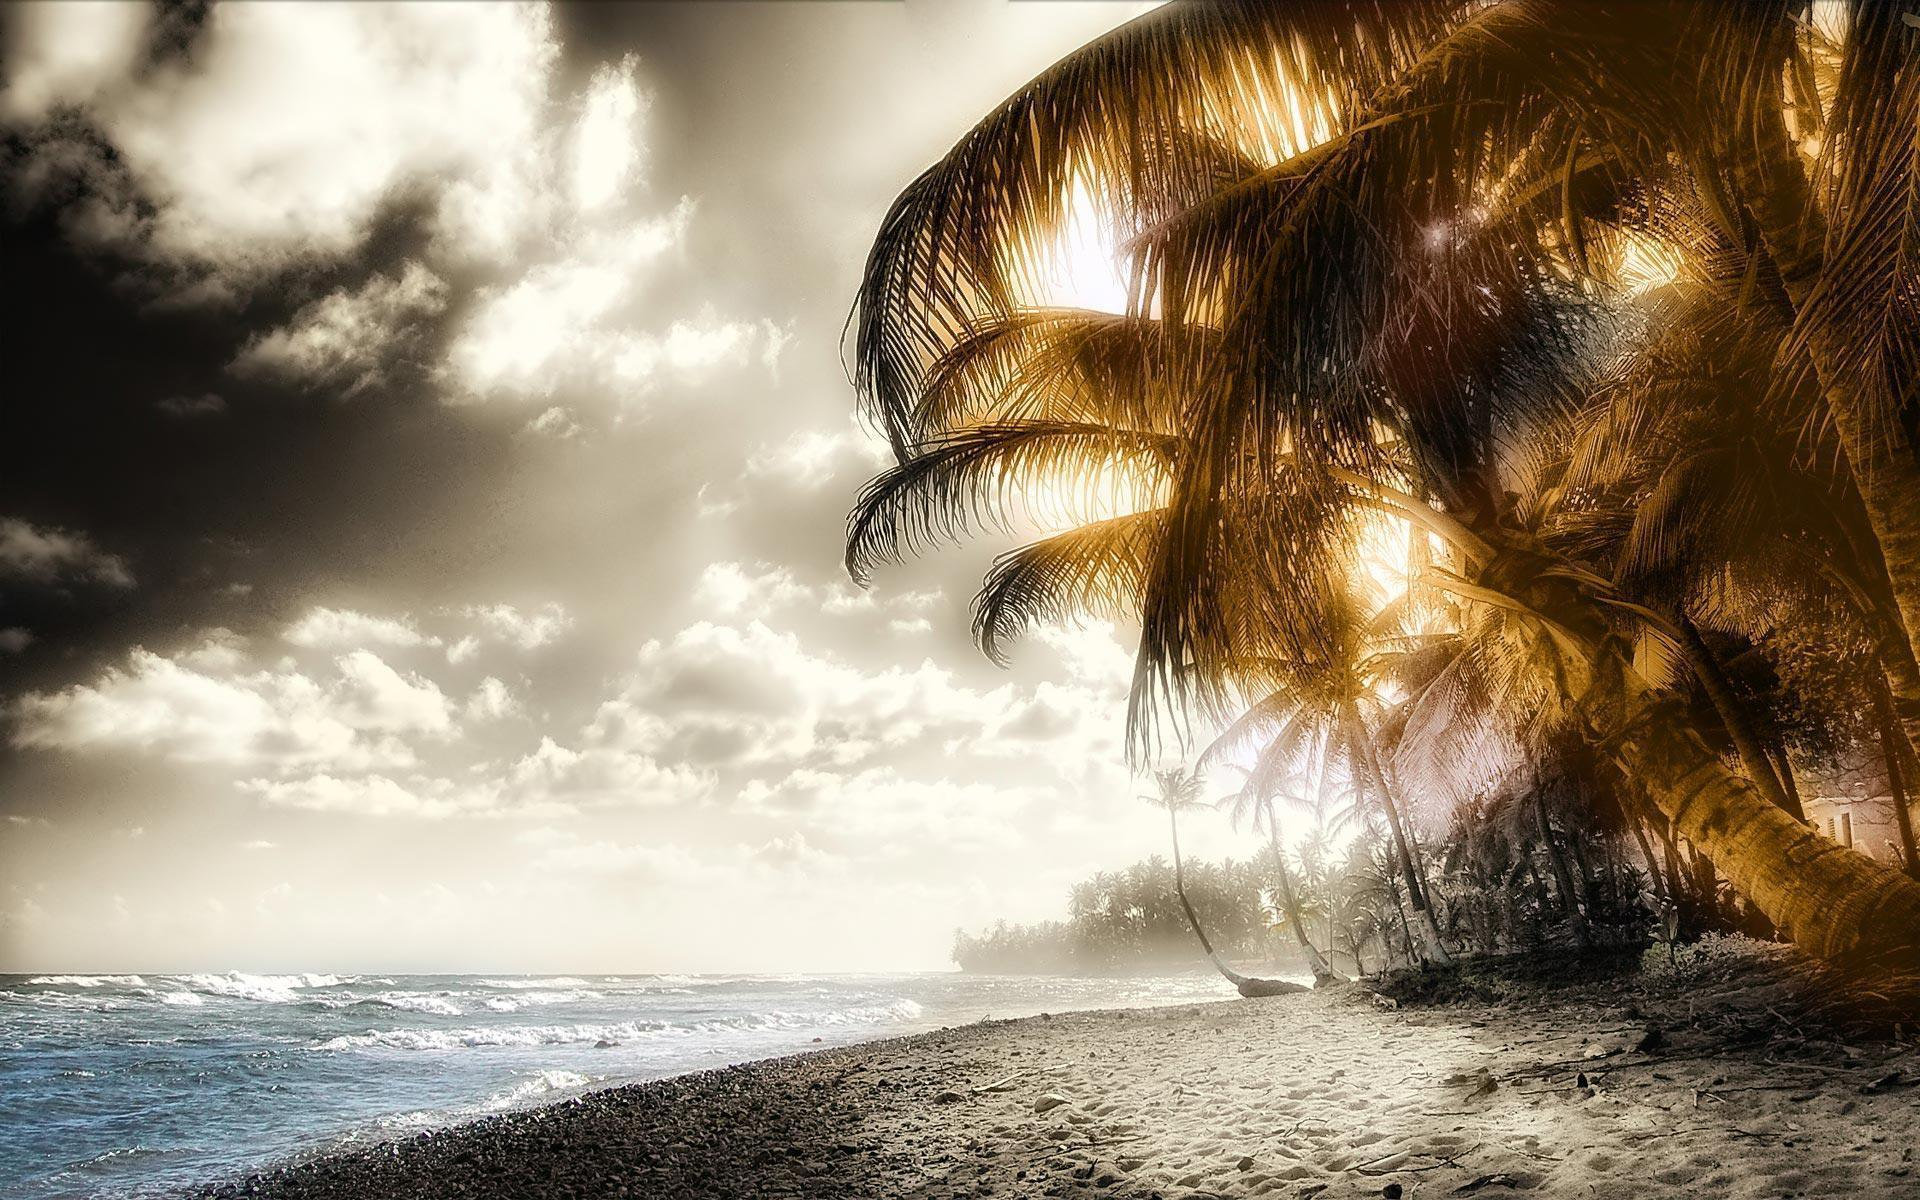 island 3d picture wallpaper - photo #22